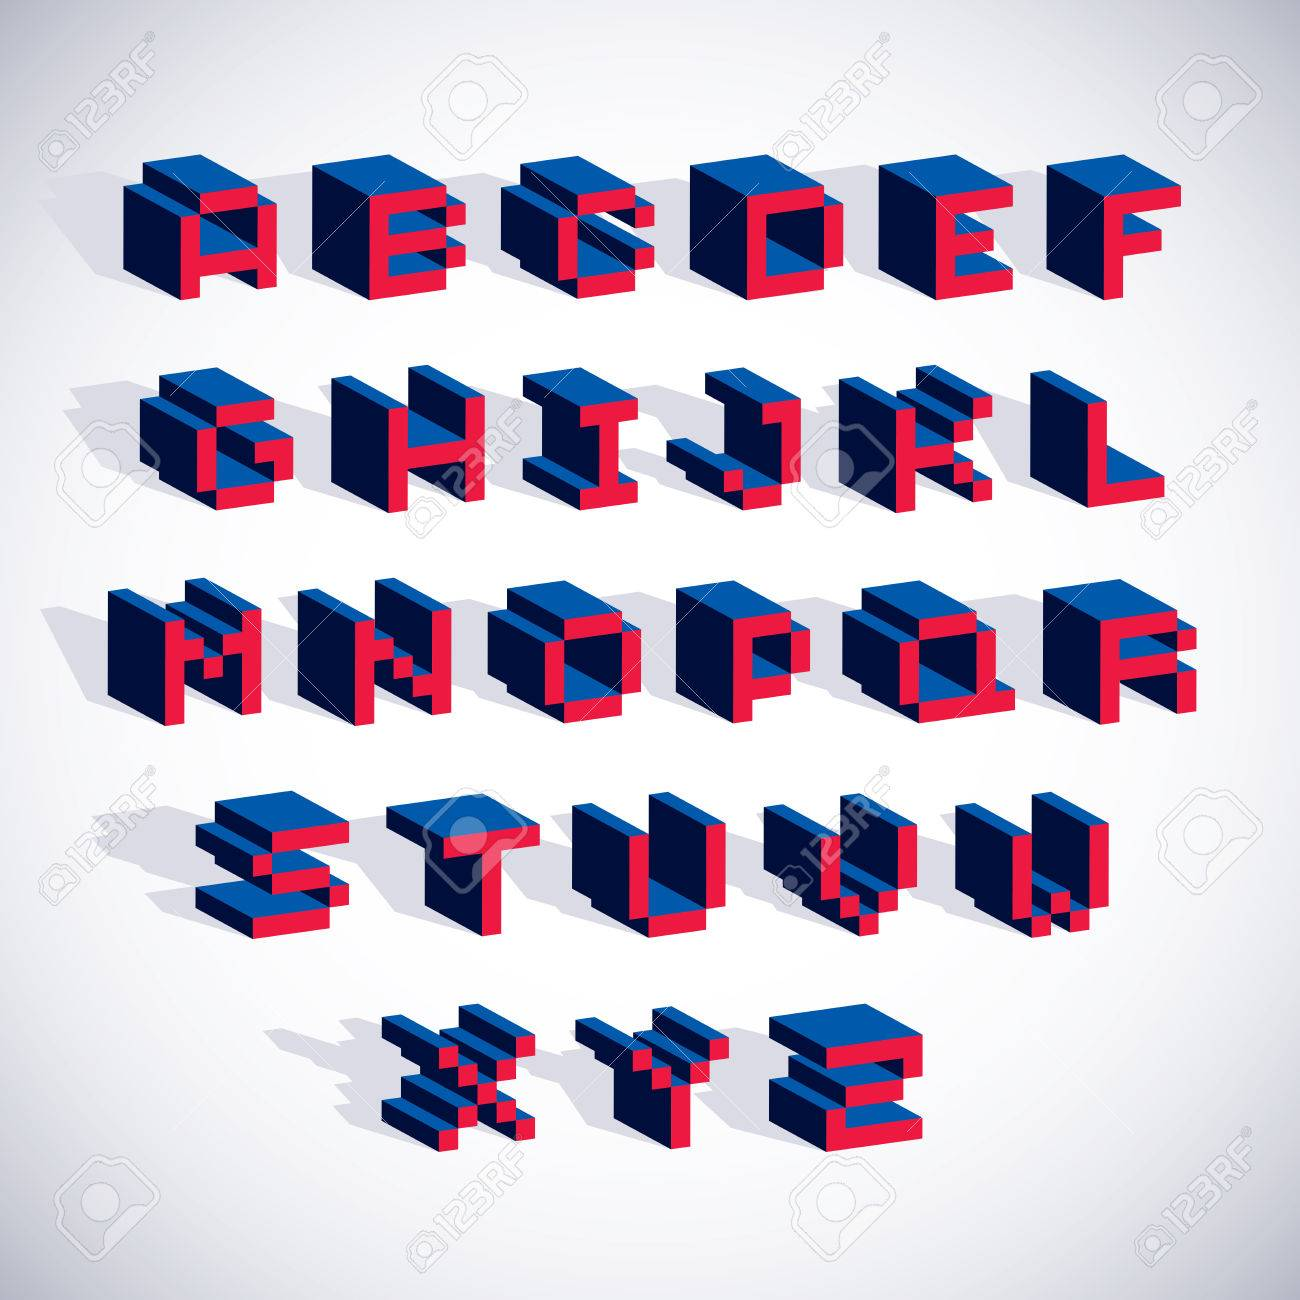 Vektor-Schrift, Typoskript In 8-Bit-Stil Erstellt. Pixelkunst ...